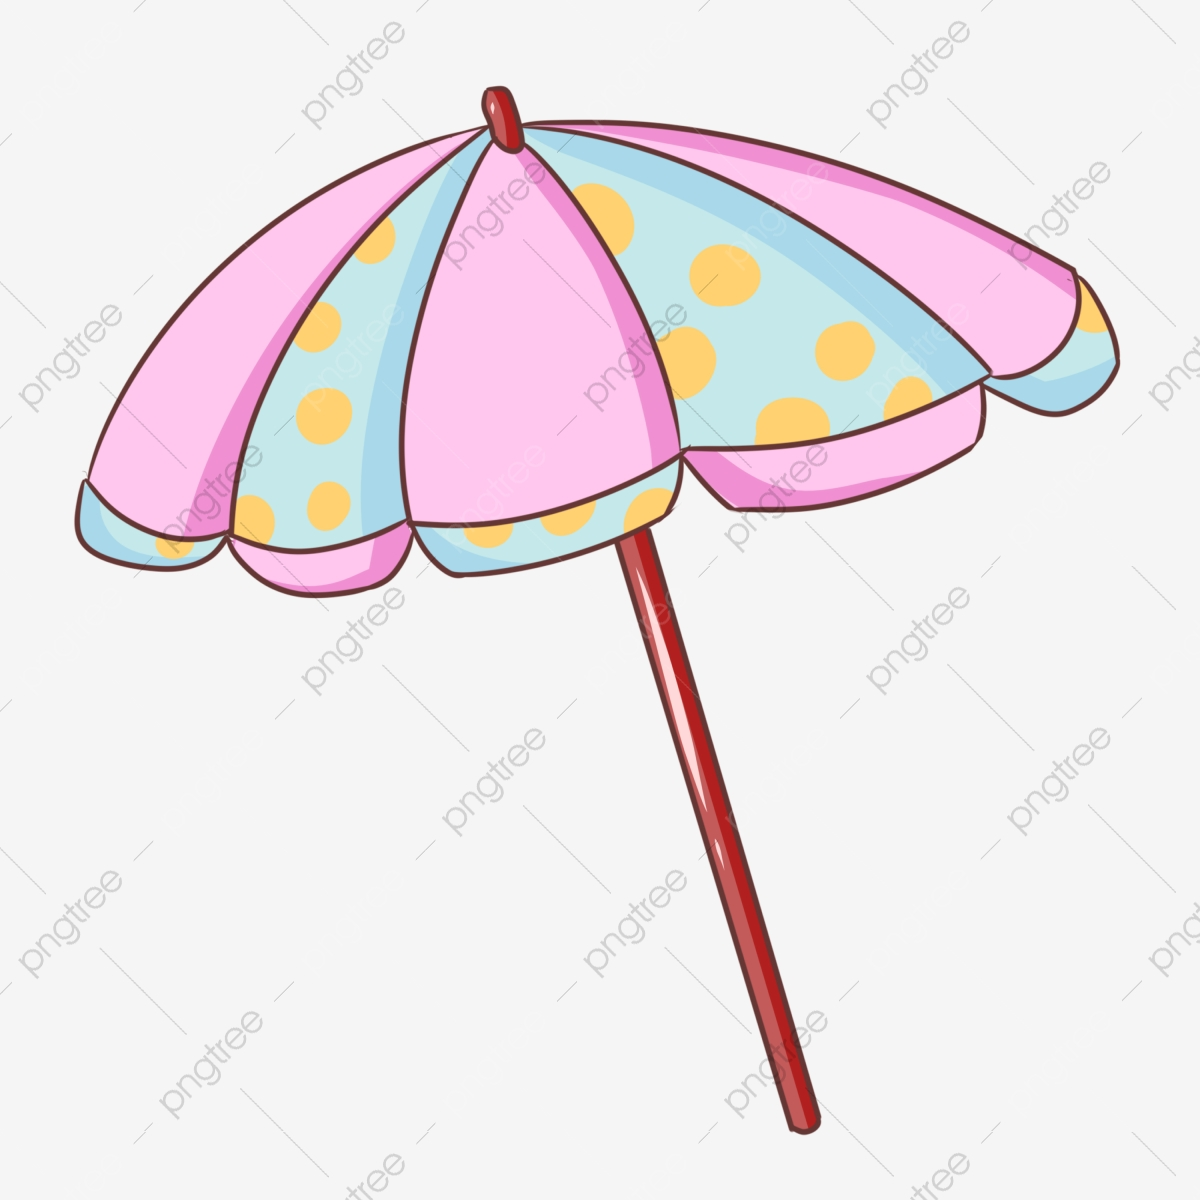 Cartoon sun yellow dots. Clipart umbrella striped umbrella